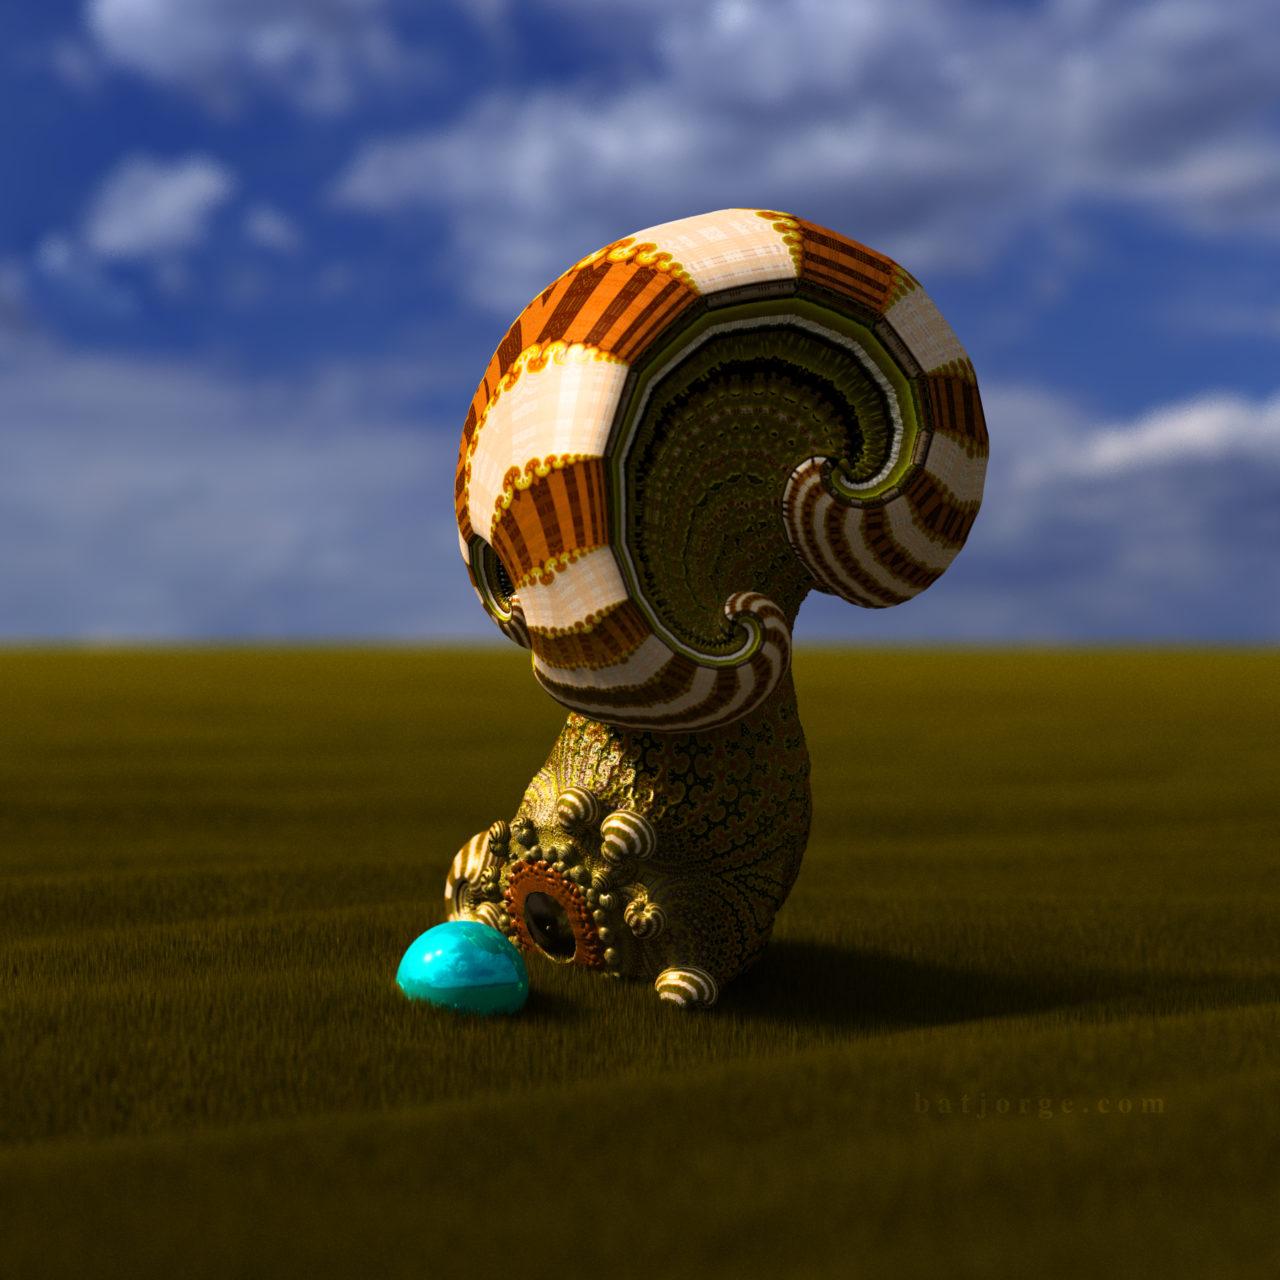 3D mandelbulber amazingsurf mod 4 grass and sphere